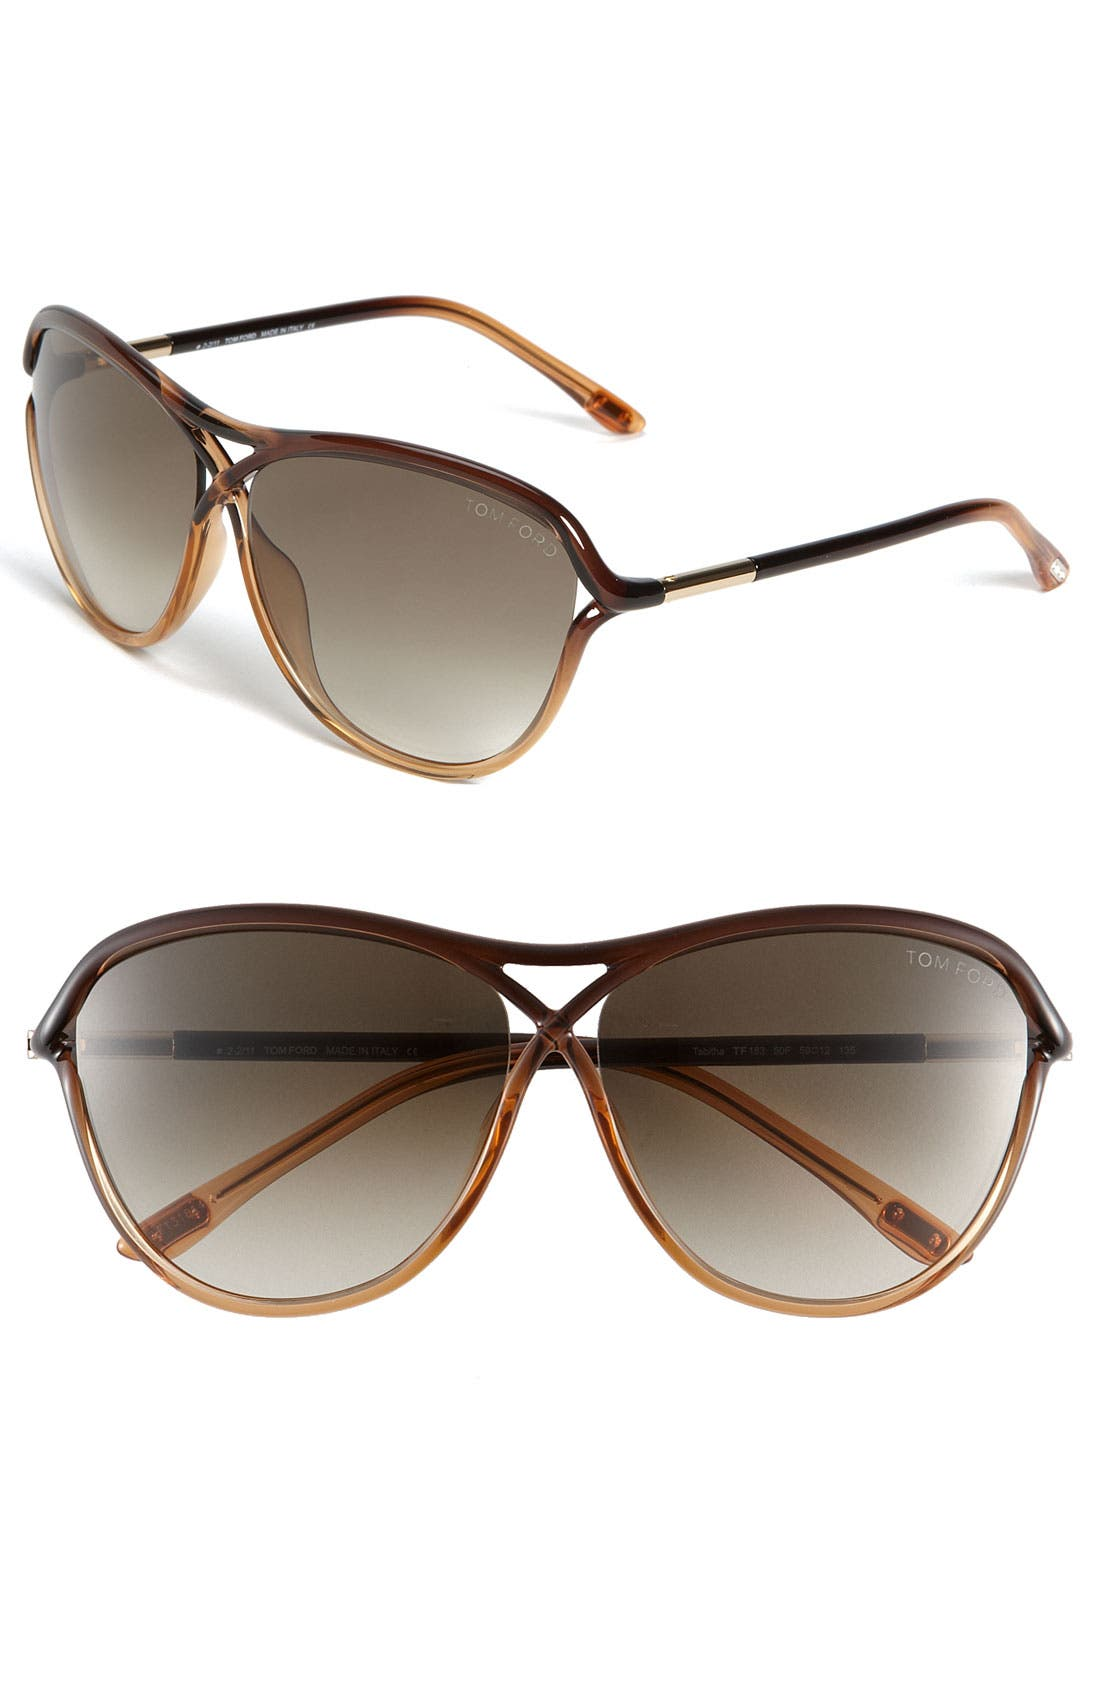 Alternate Image 1 Selected - Tom Ford 'Tabitha' Aviator Sunglasses